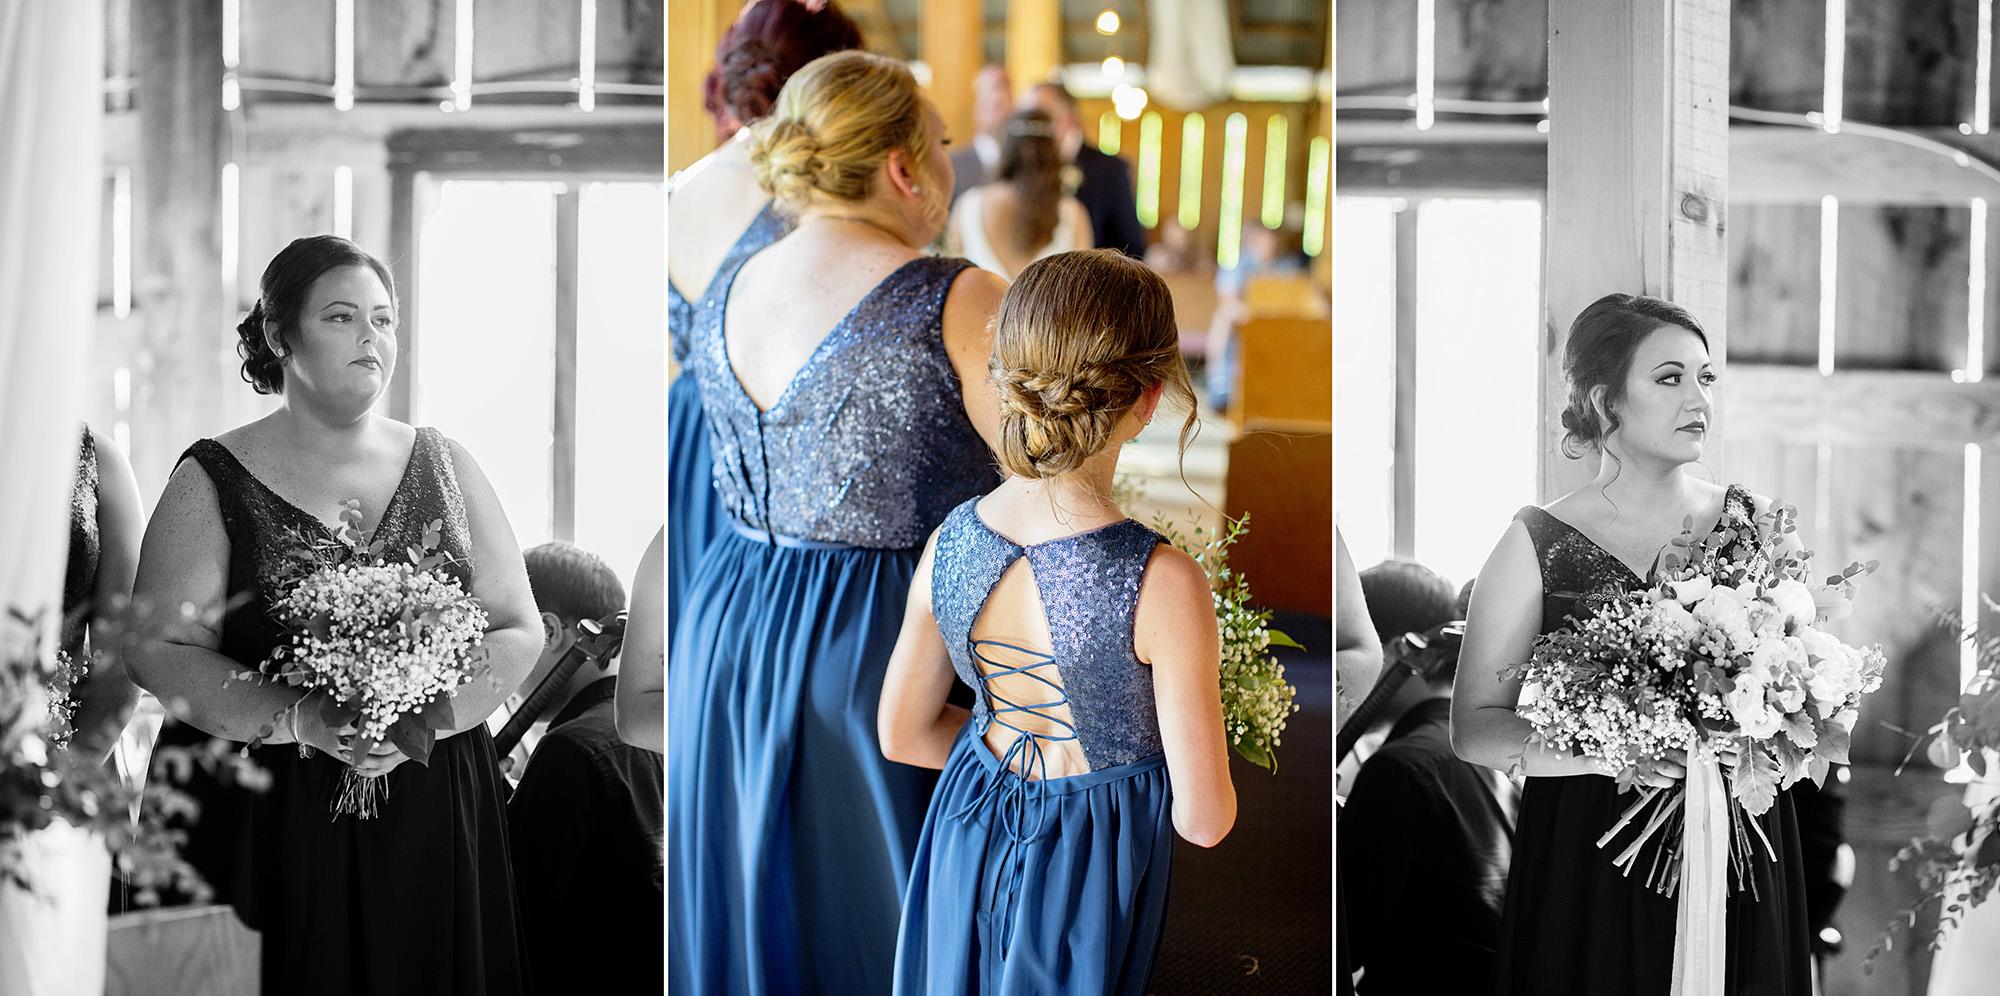 Seriously_Sabrina_Photography_Red_River_Gorge_Wedding_Barn_Robinson64.jpg